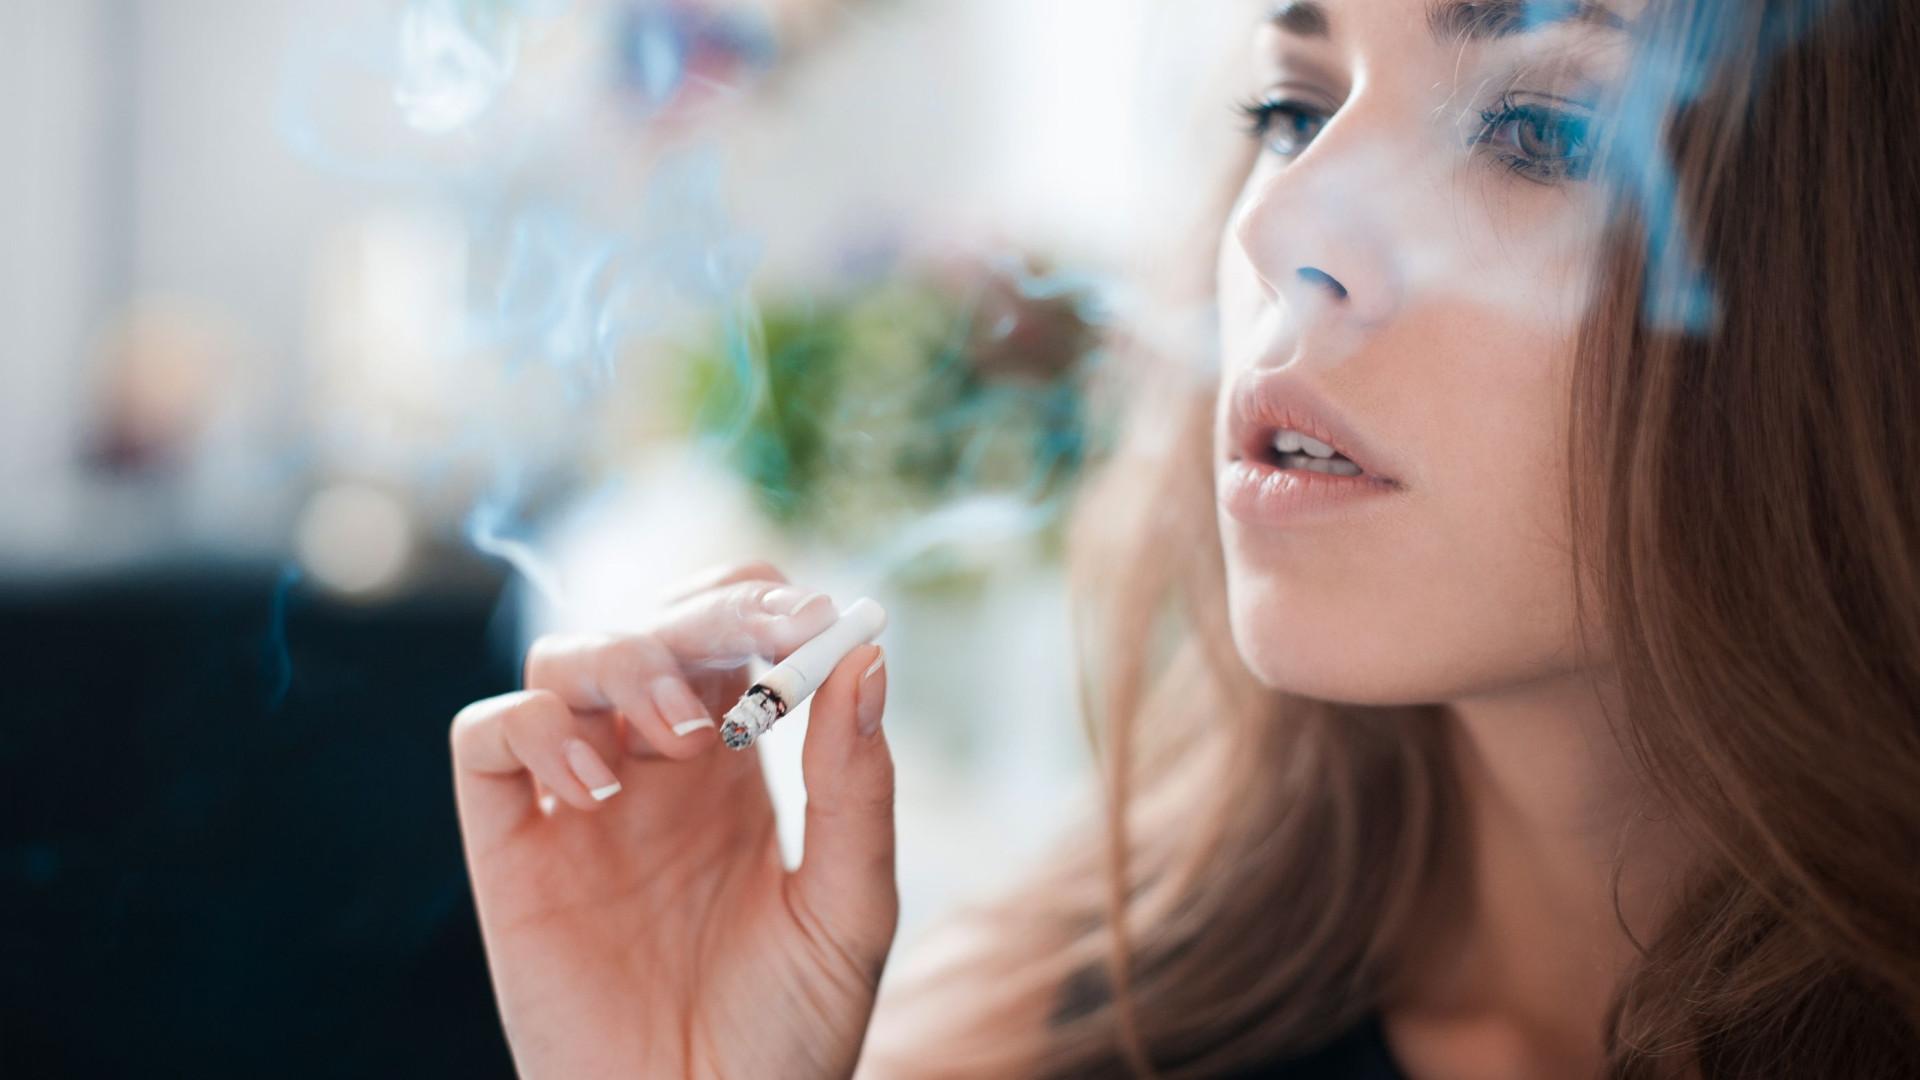 Desista de vez do tabaco! Este é o melhor método para deixar de fumar